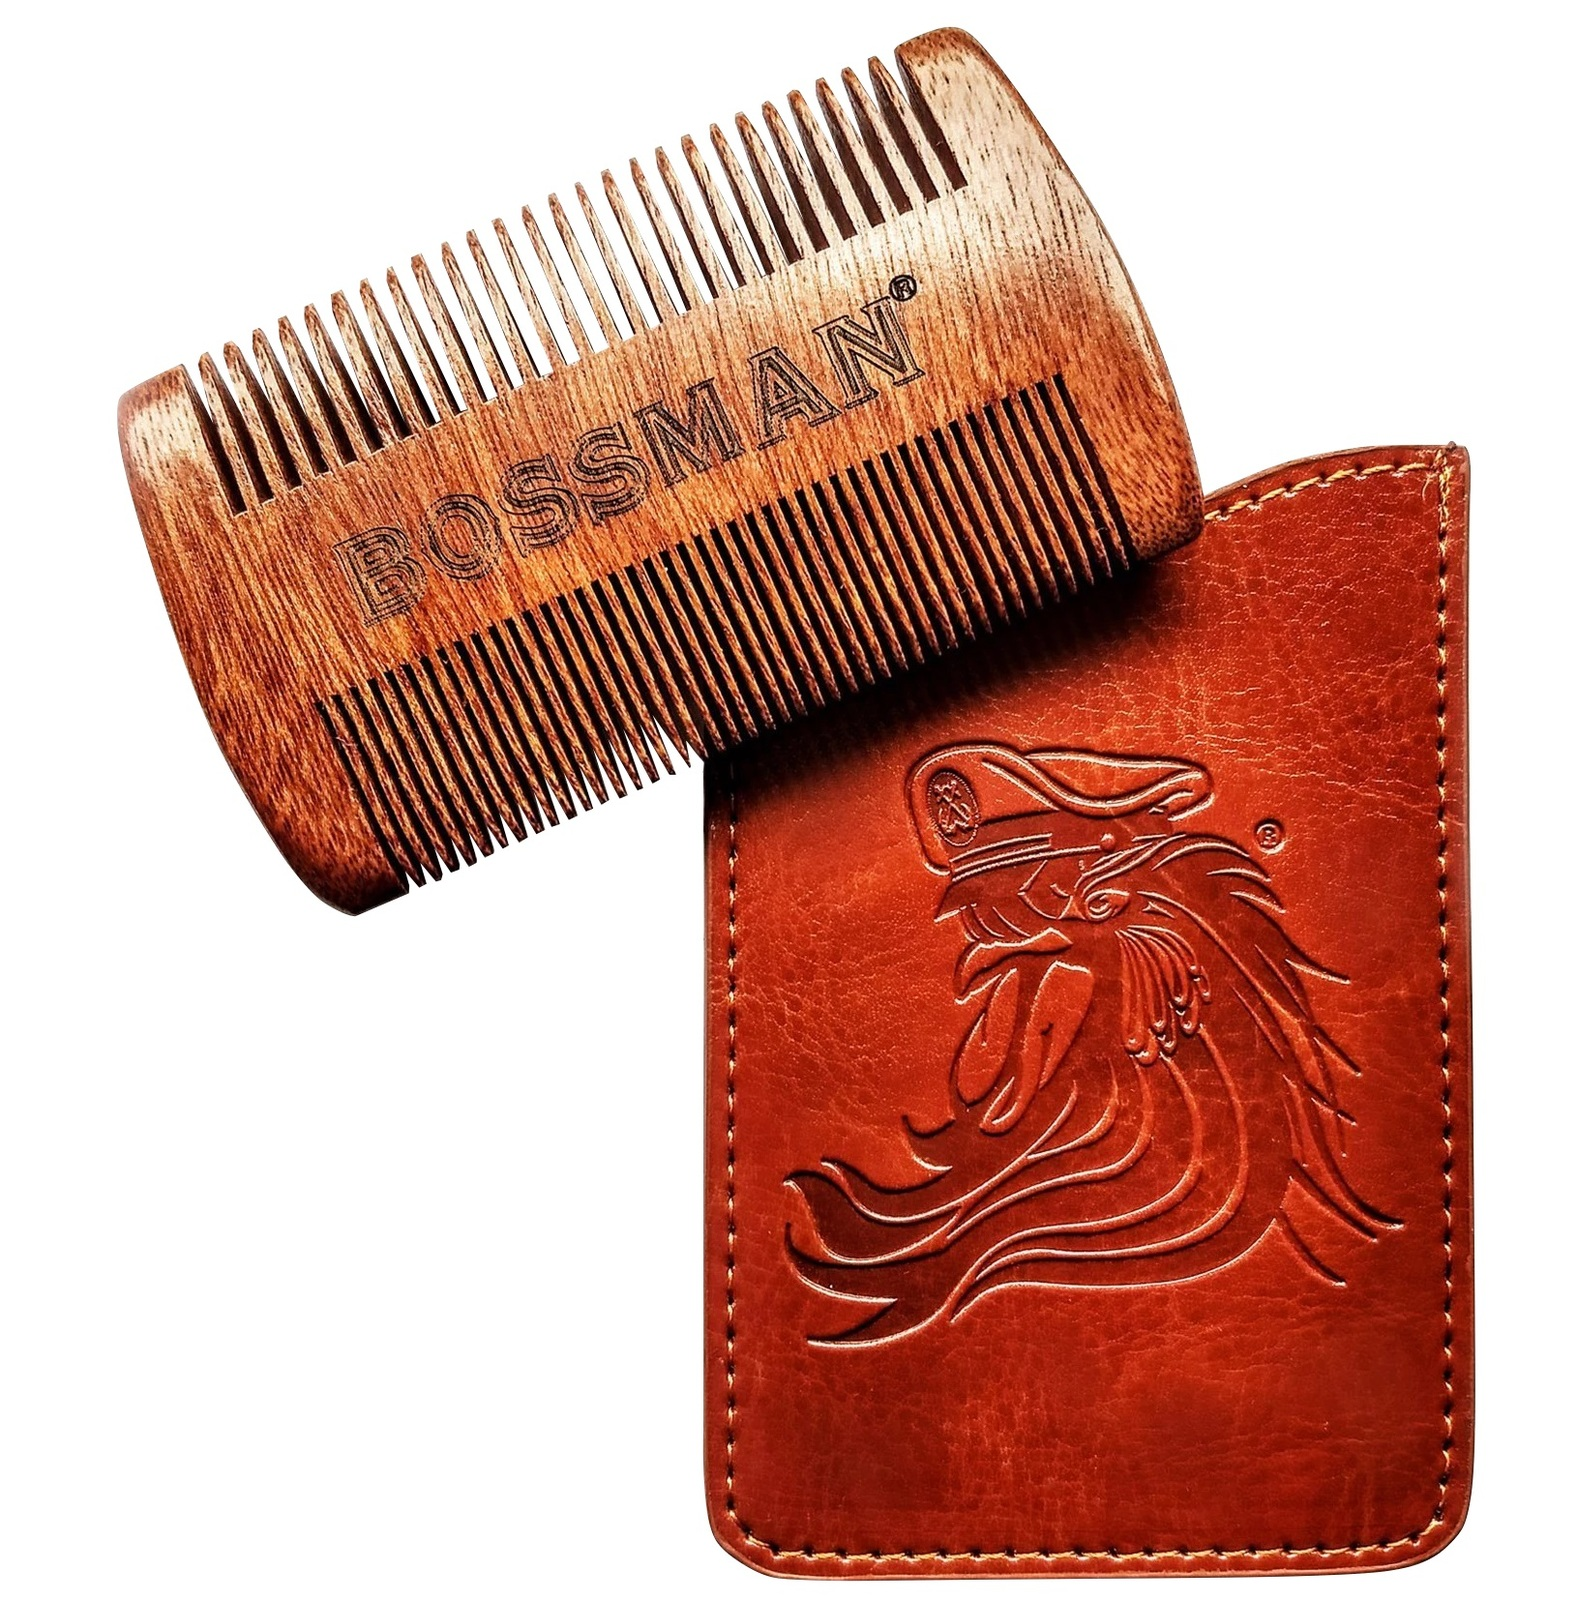 Bossman: Pocket Sandalwood Beard/Moustache Comb image